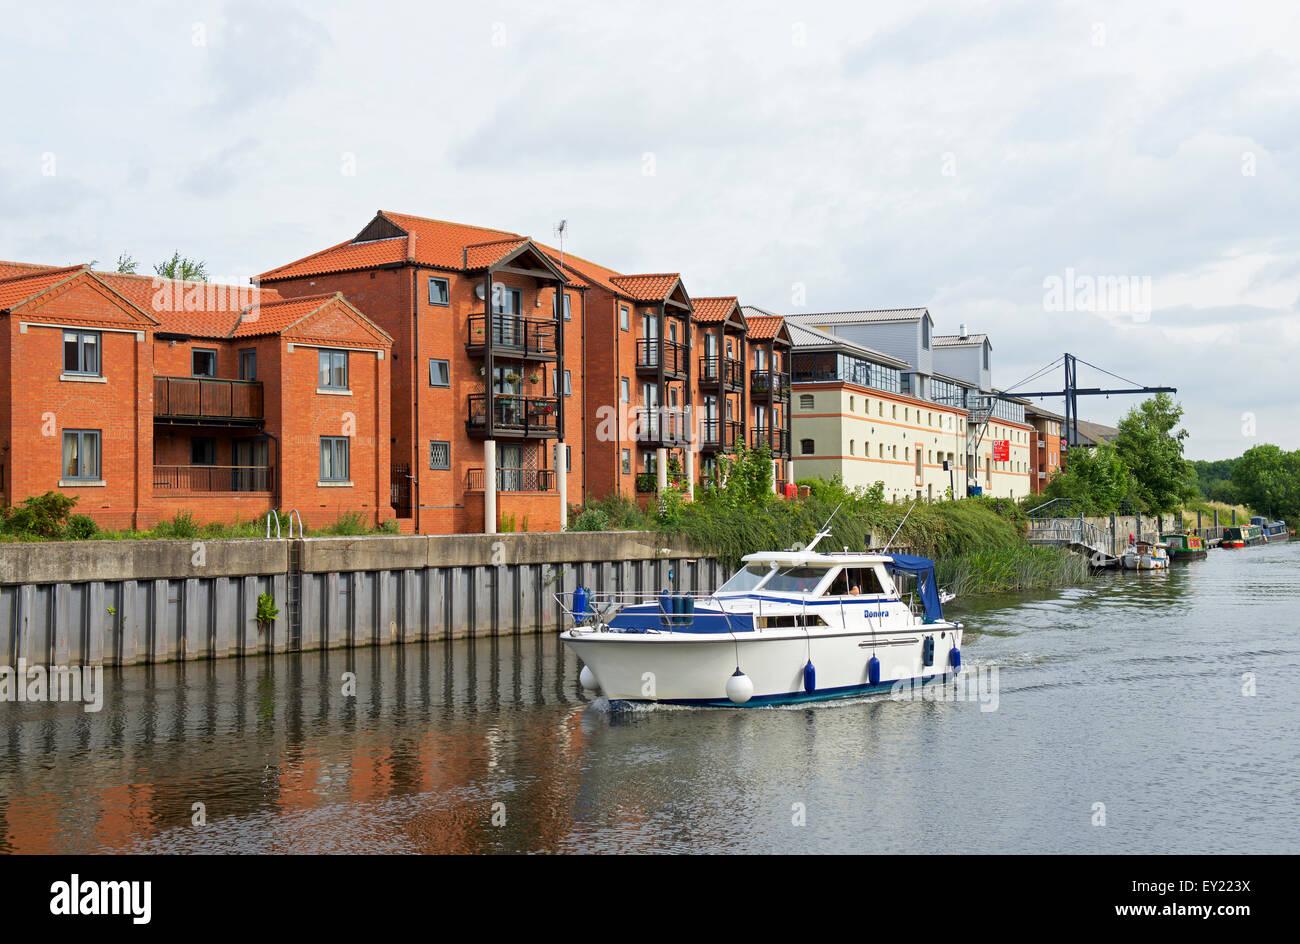 Boat on River Trent, Newark, Nottinghamshire, England UK - Stock Image